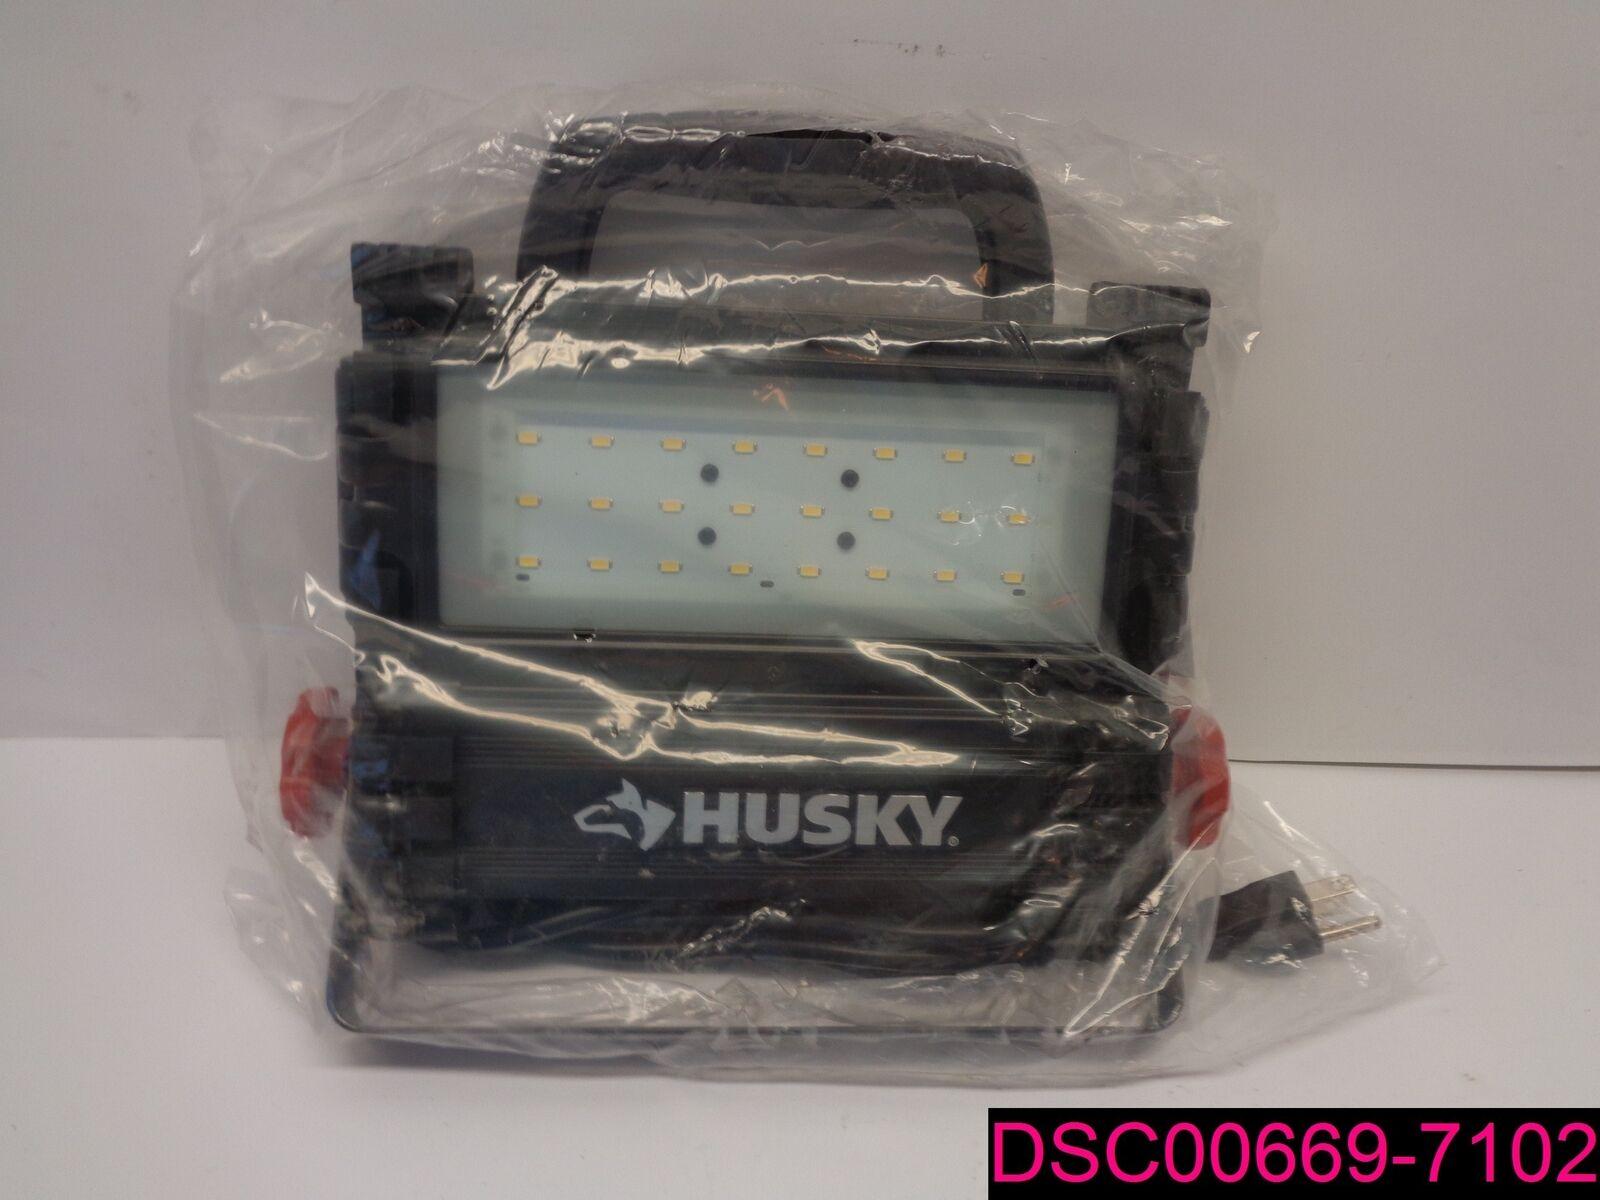 HUSKEY LED MULTI-DIRECTIONAL WORK LIGHT DE002-3PS48  (NO TRI POD)